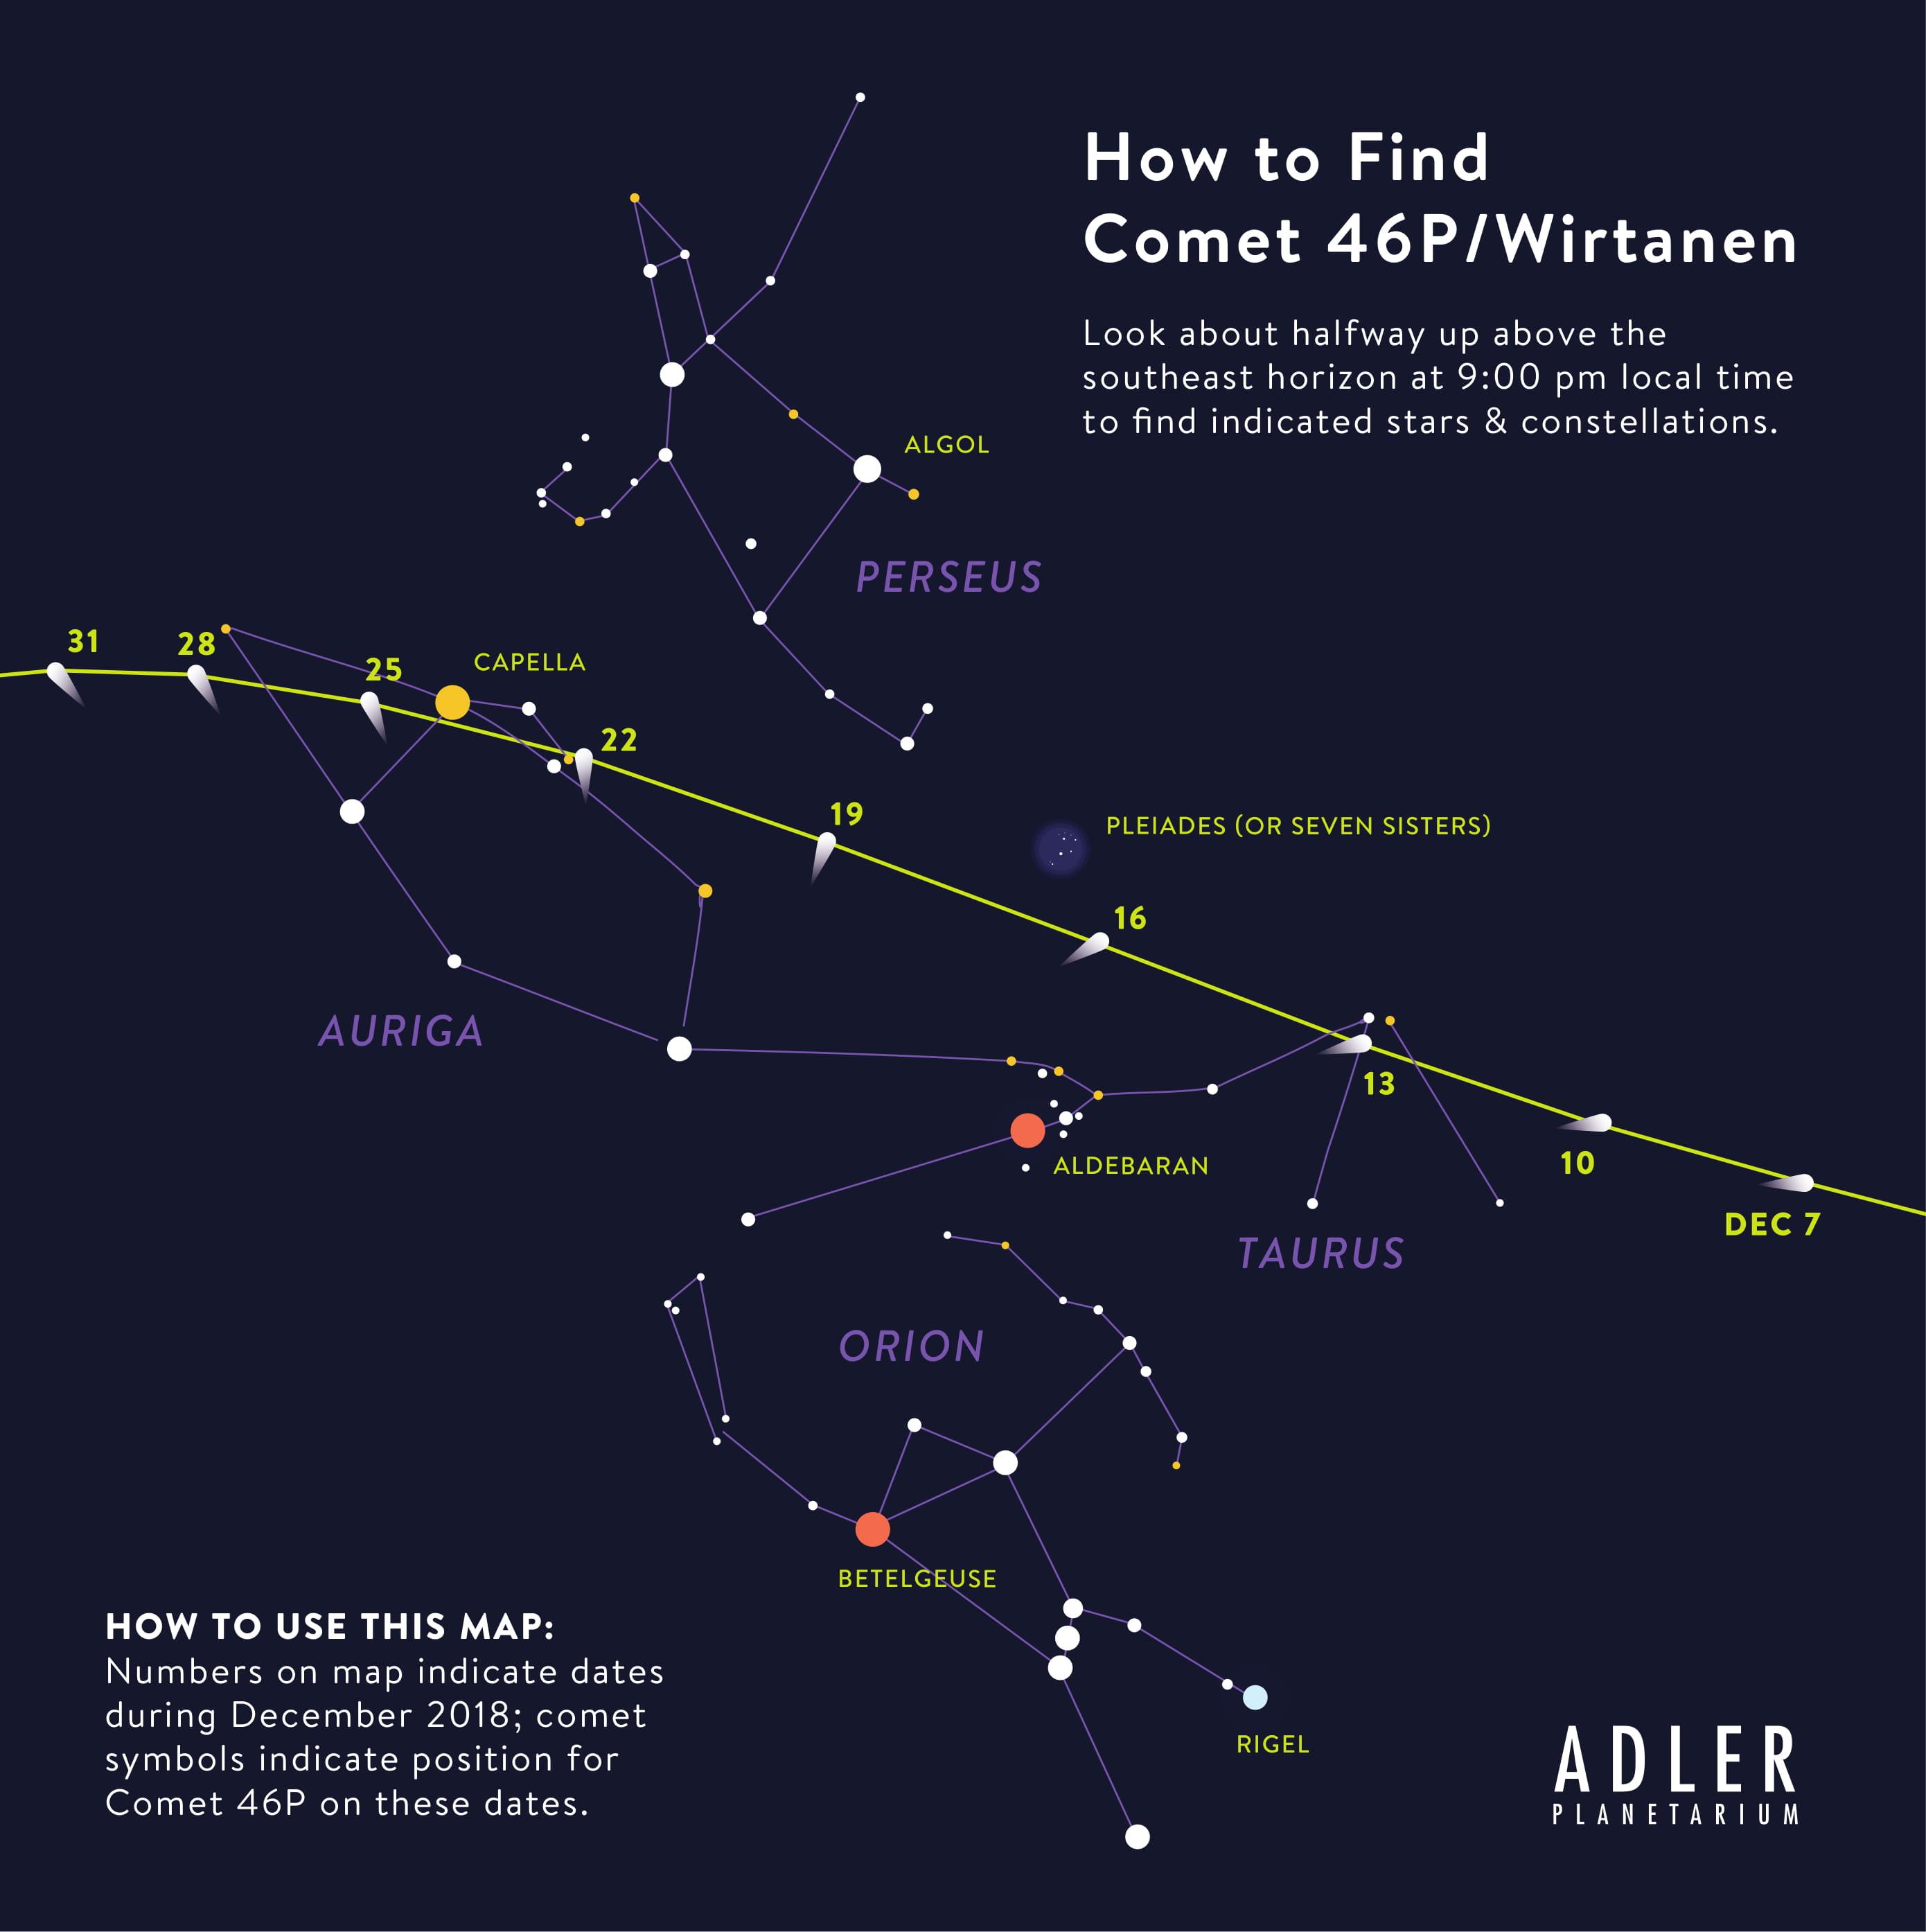 How to find Comet 46P/Wirtanen